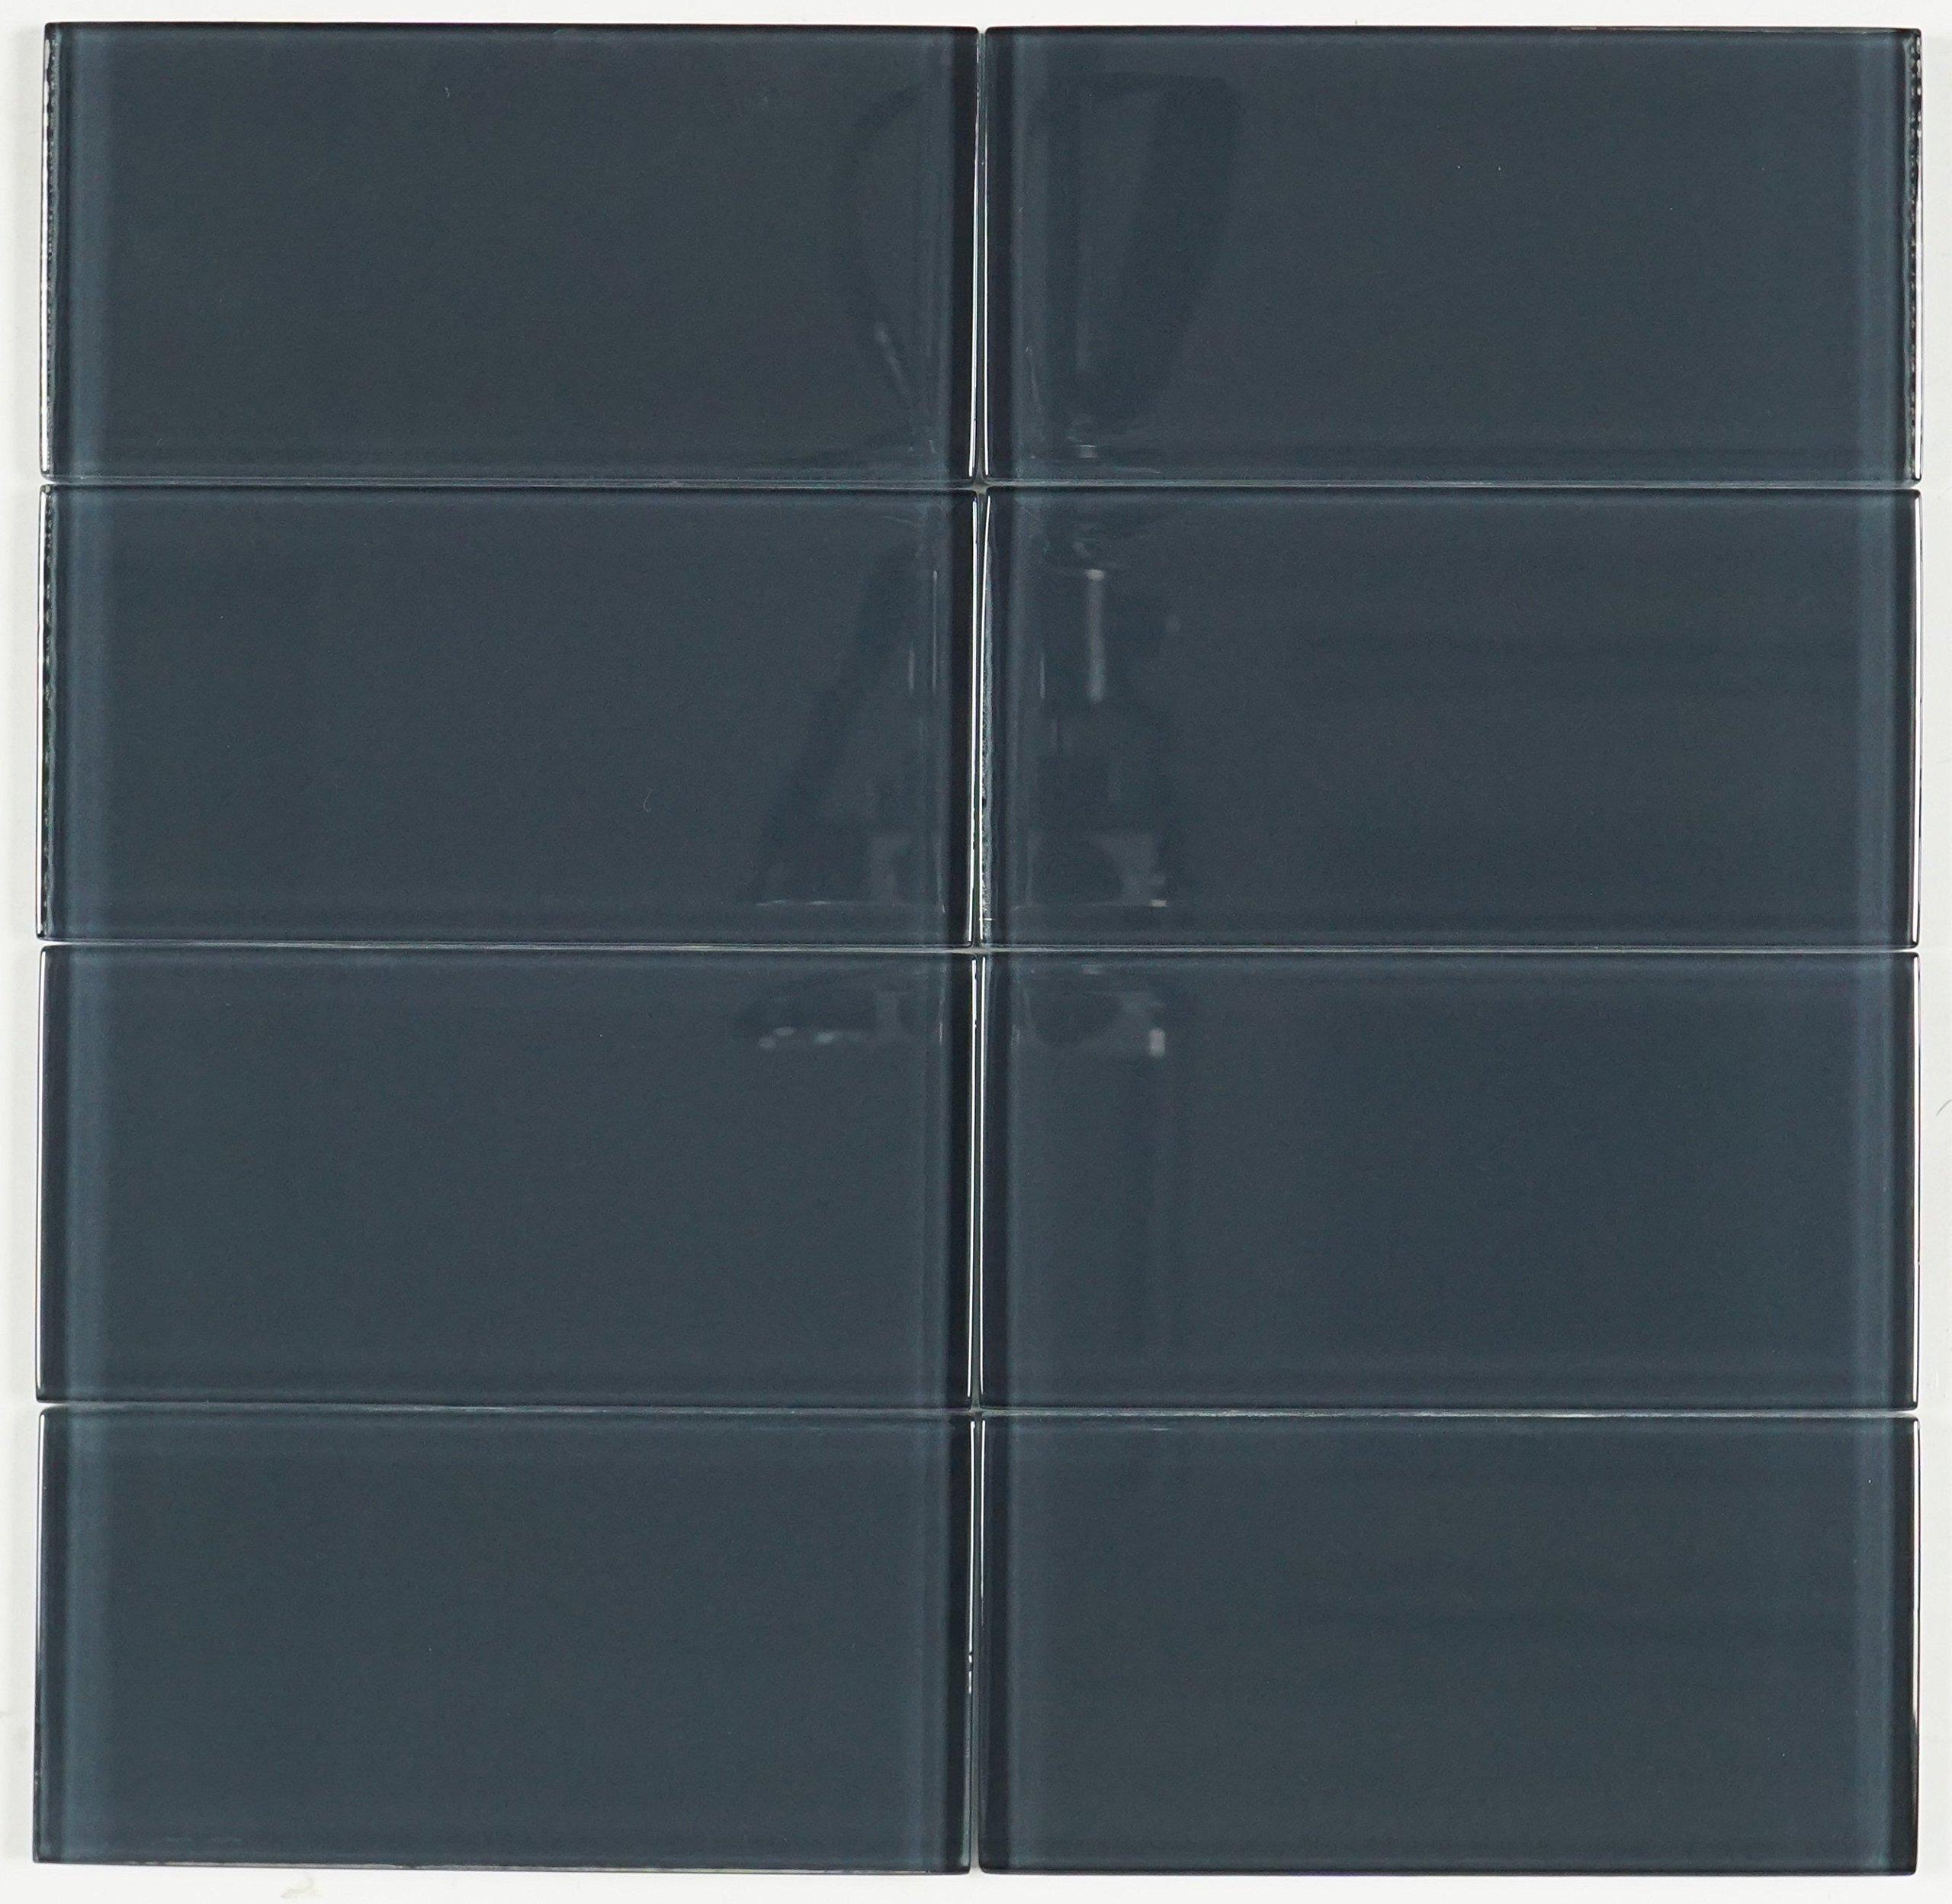 THG-10 Dark grey subway tile 3x6 - Kitchen and Bath Backsplash Wall Tile(8pcs)